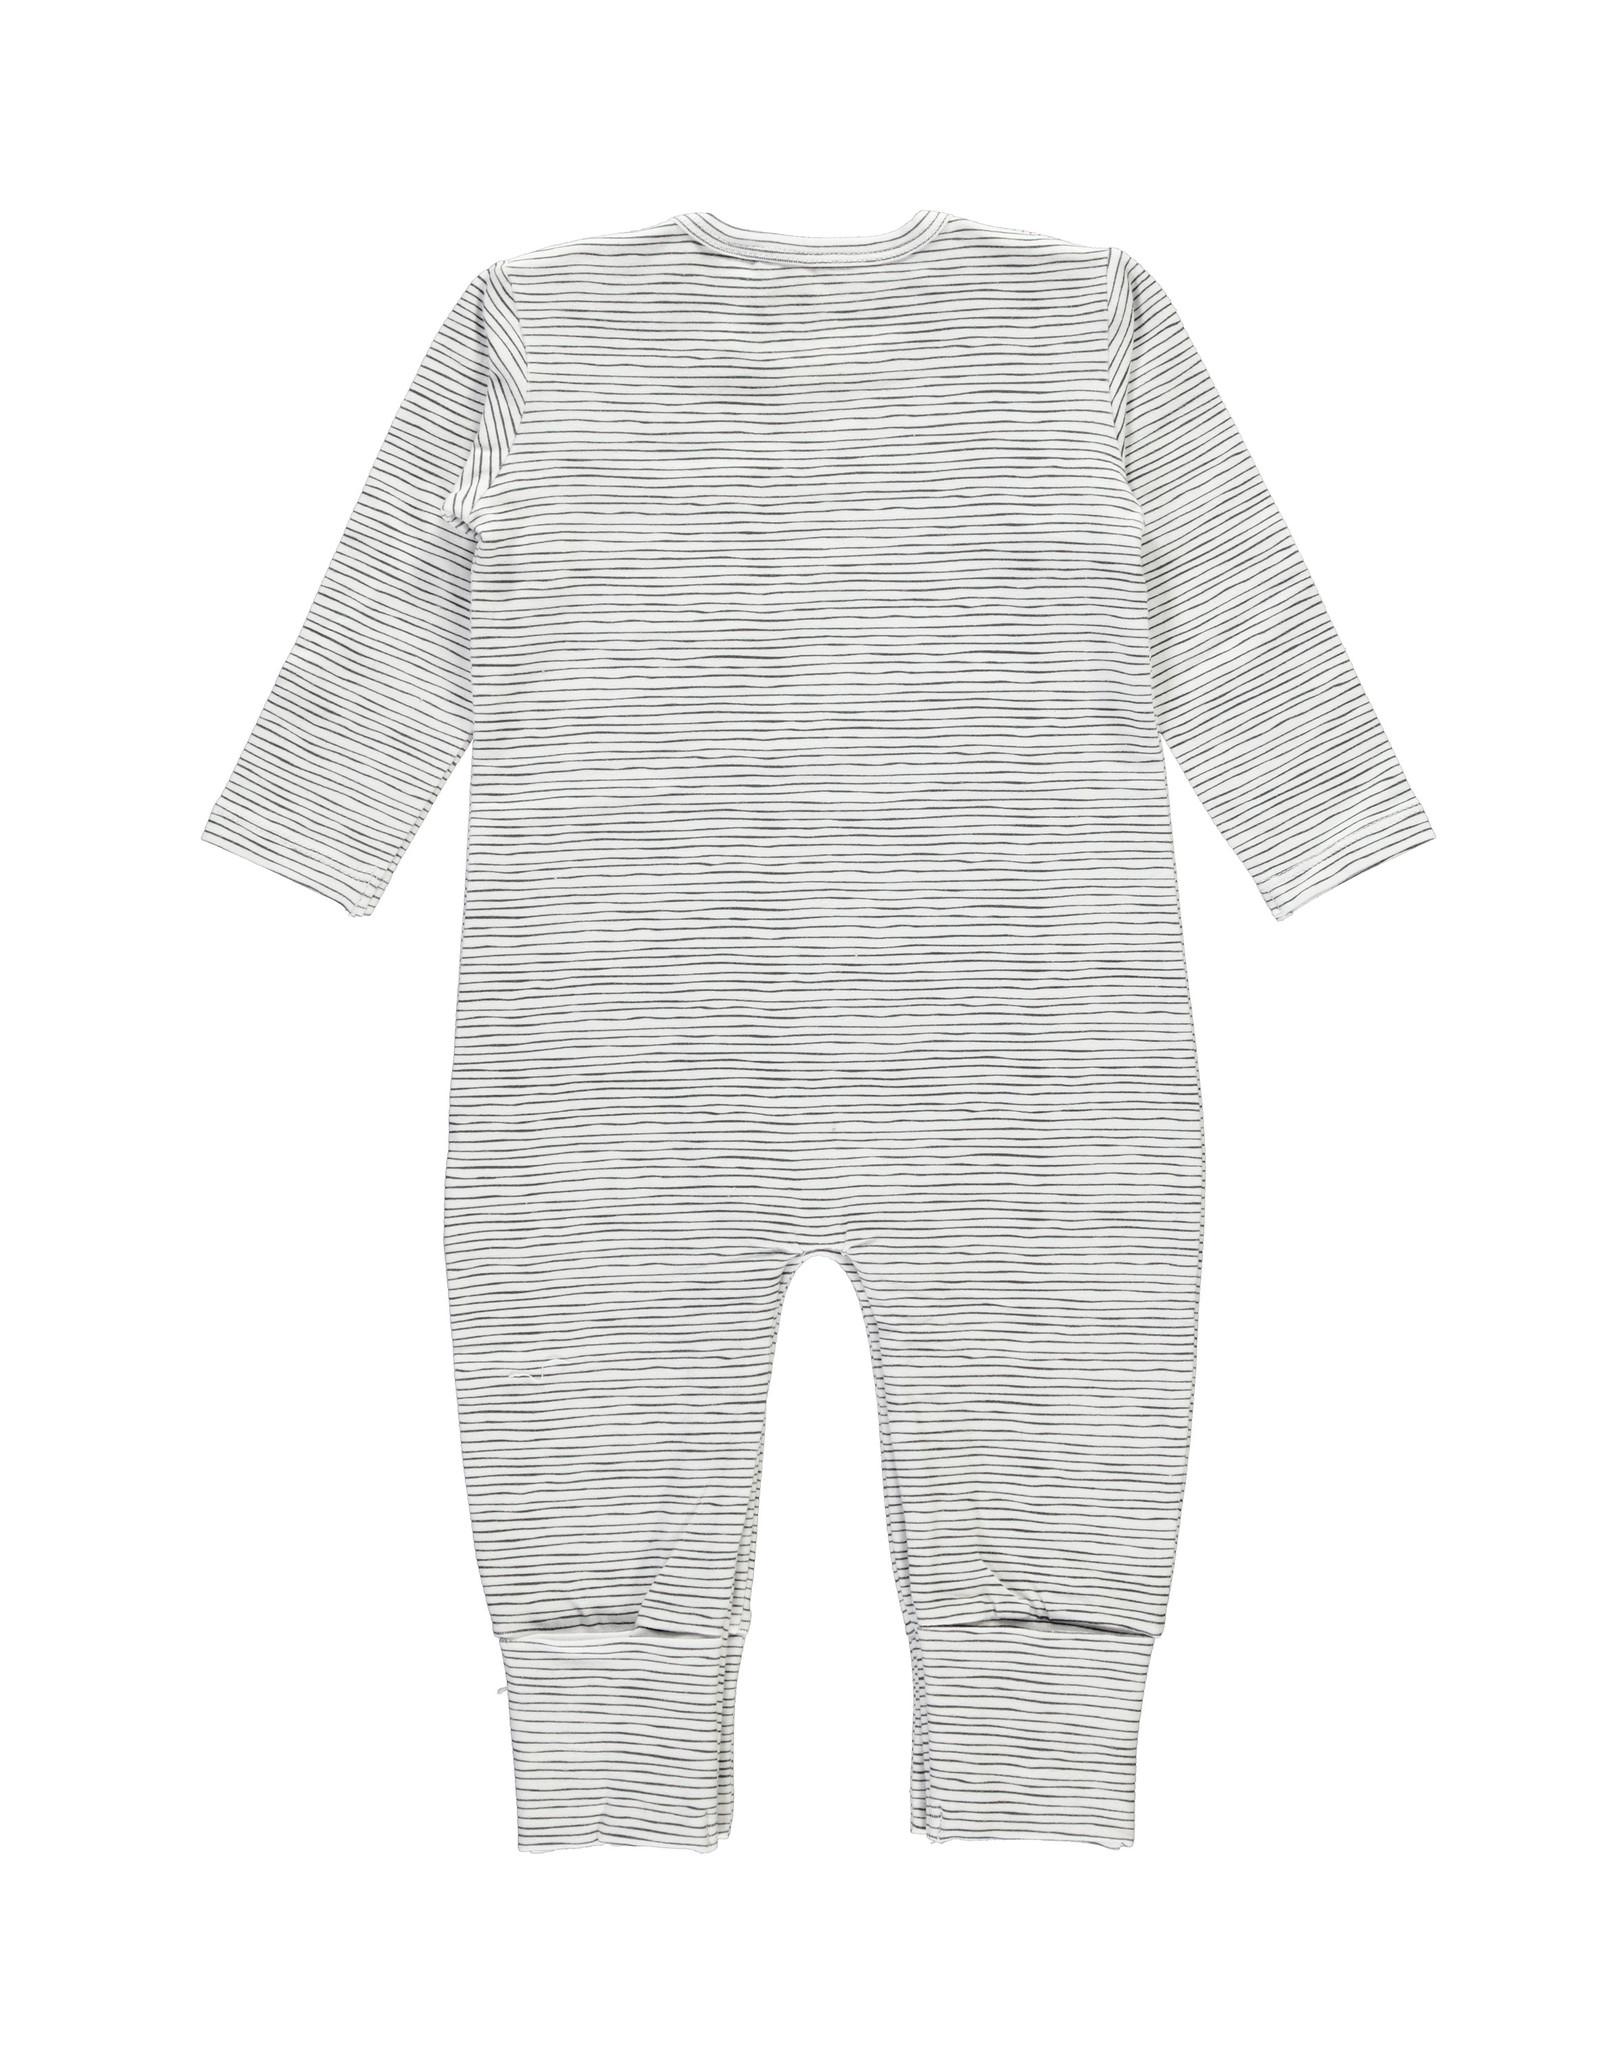 Bampidano New Born overall printed stripe with envelope feet, black/white stripe